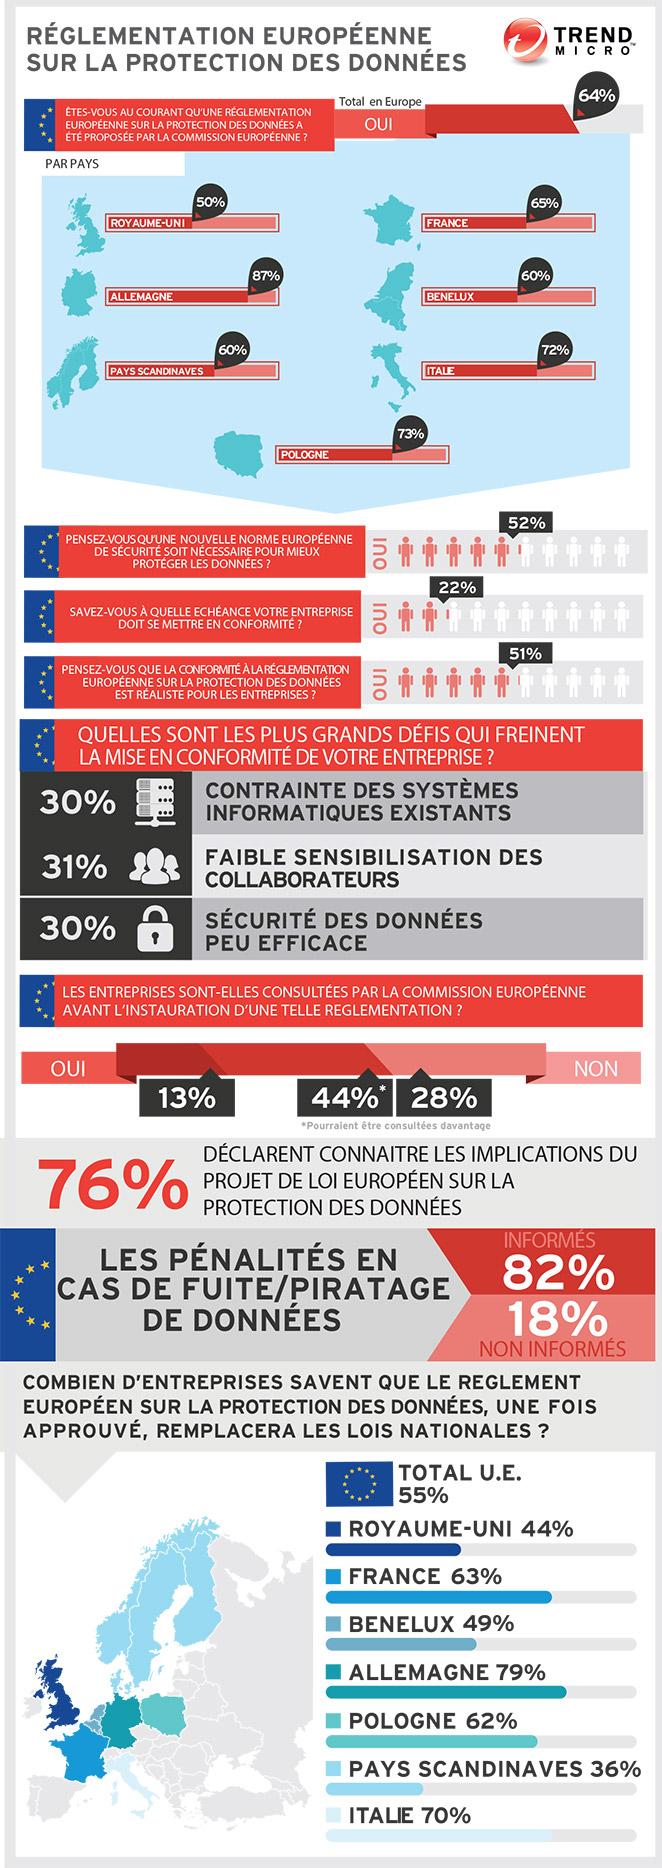 infographic-eu-datalaw-fr